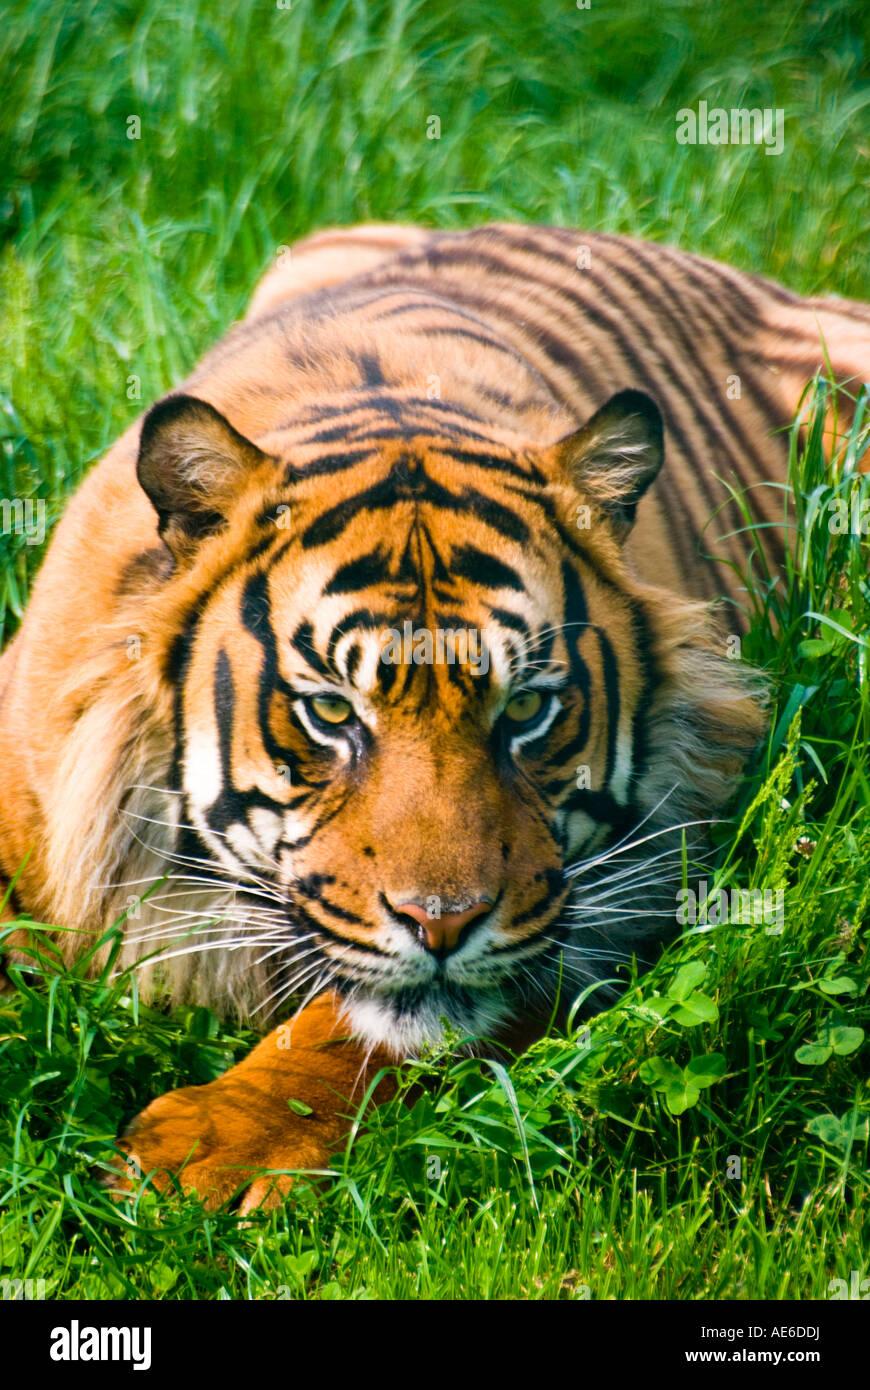 Sumatran Tiger Portrait - Stock Image